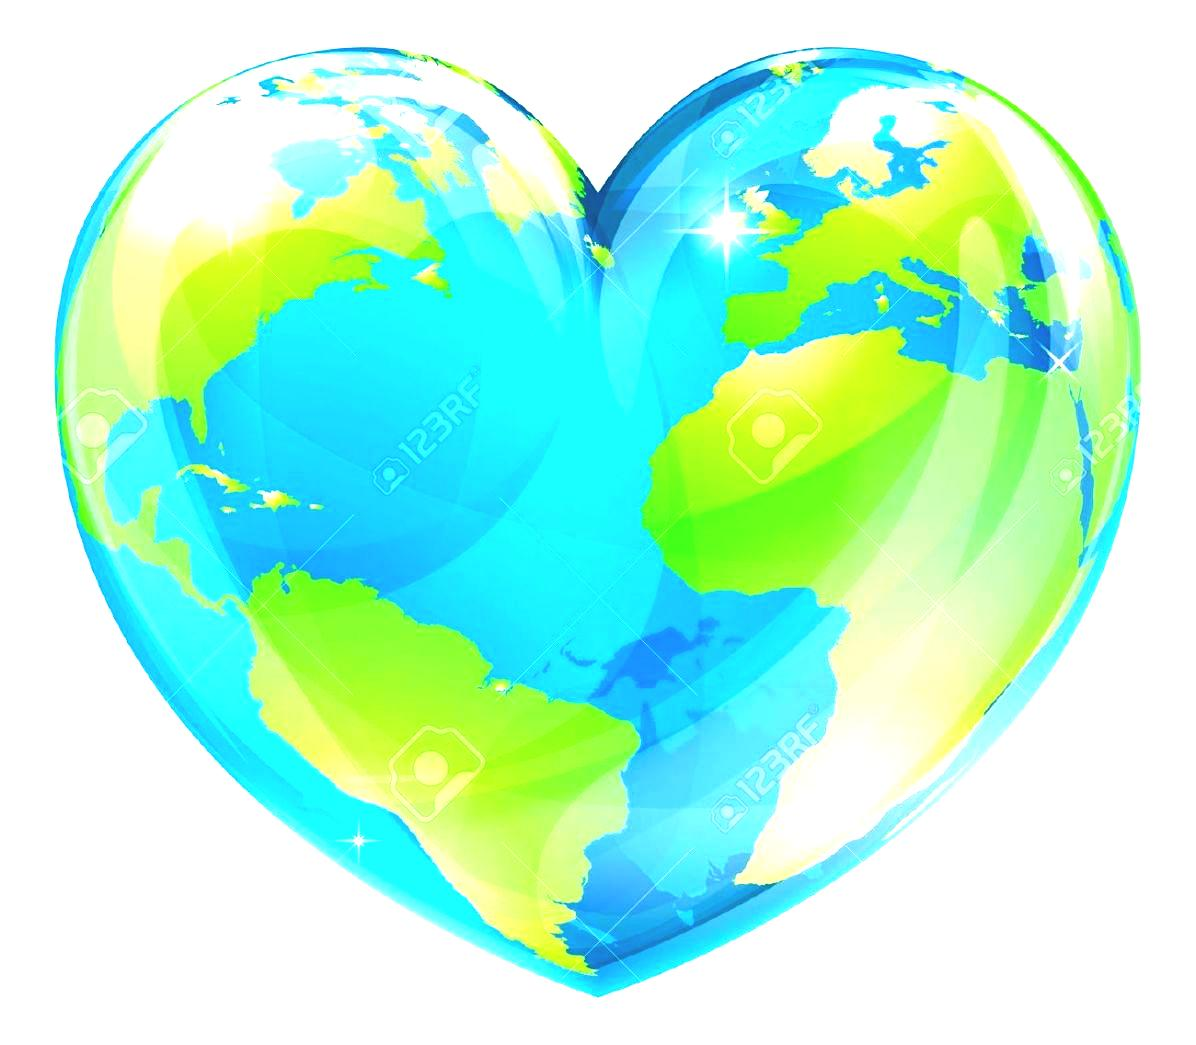 Hearts around the world clipart.